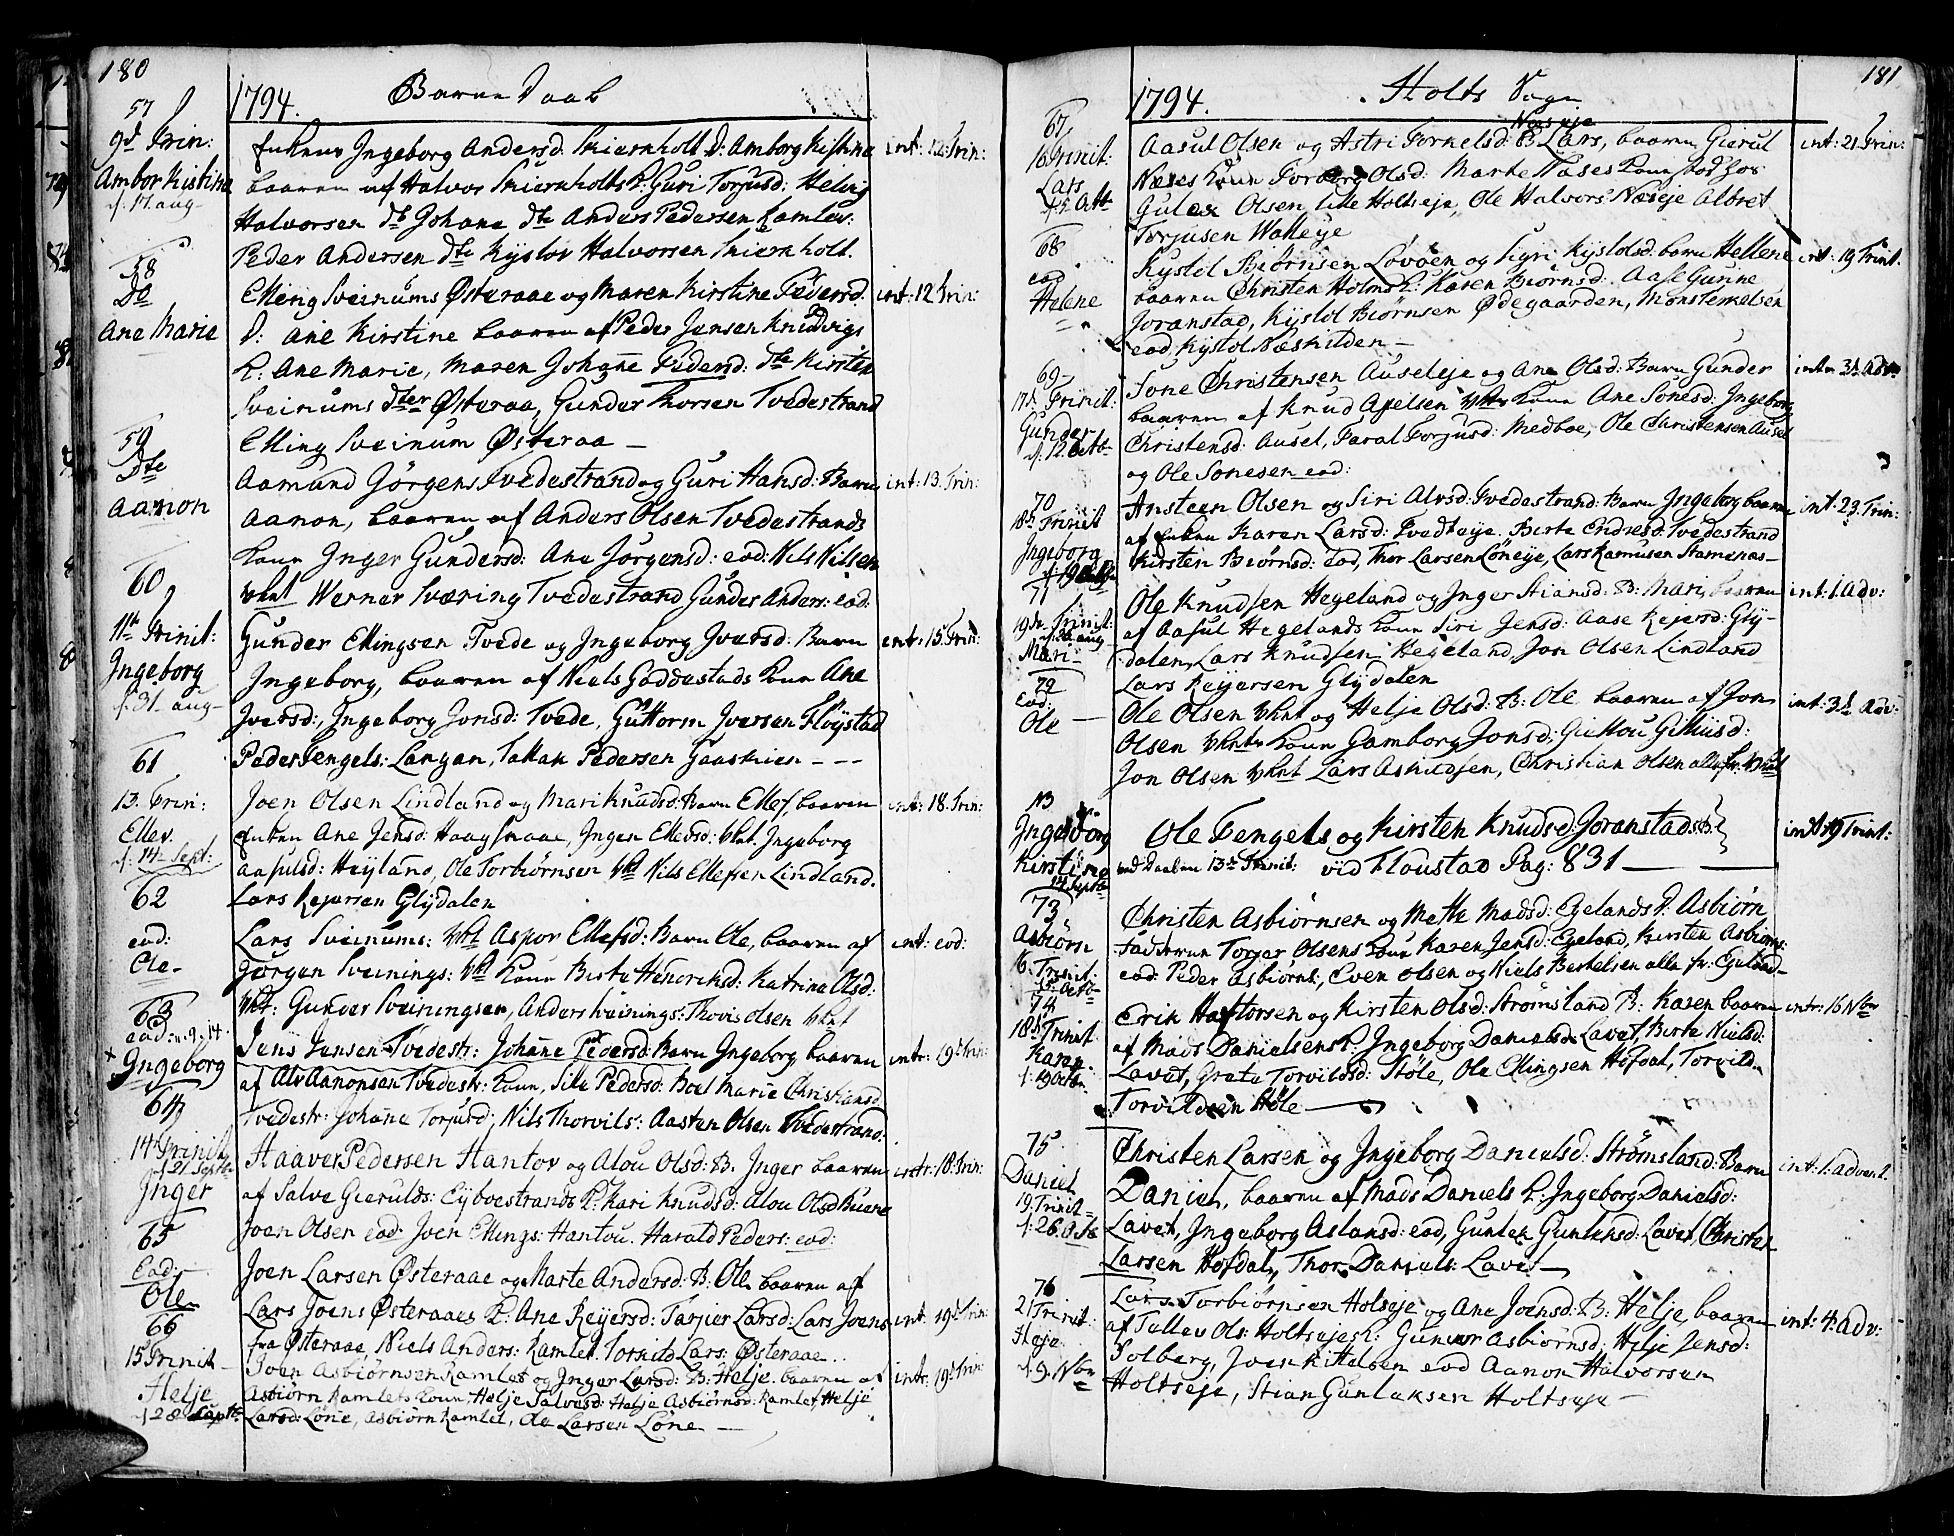 SAK, Holt sokneprestkontor, F/Fa/L0003: Ministerialbok nr. A 3, 1765-1798, s. 180-181